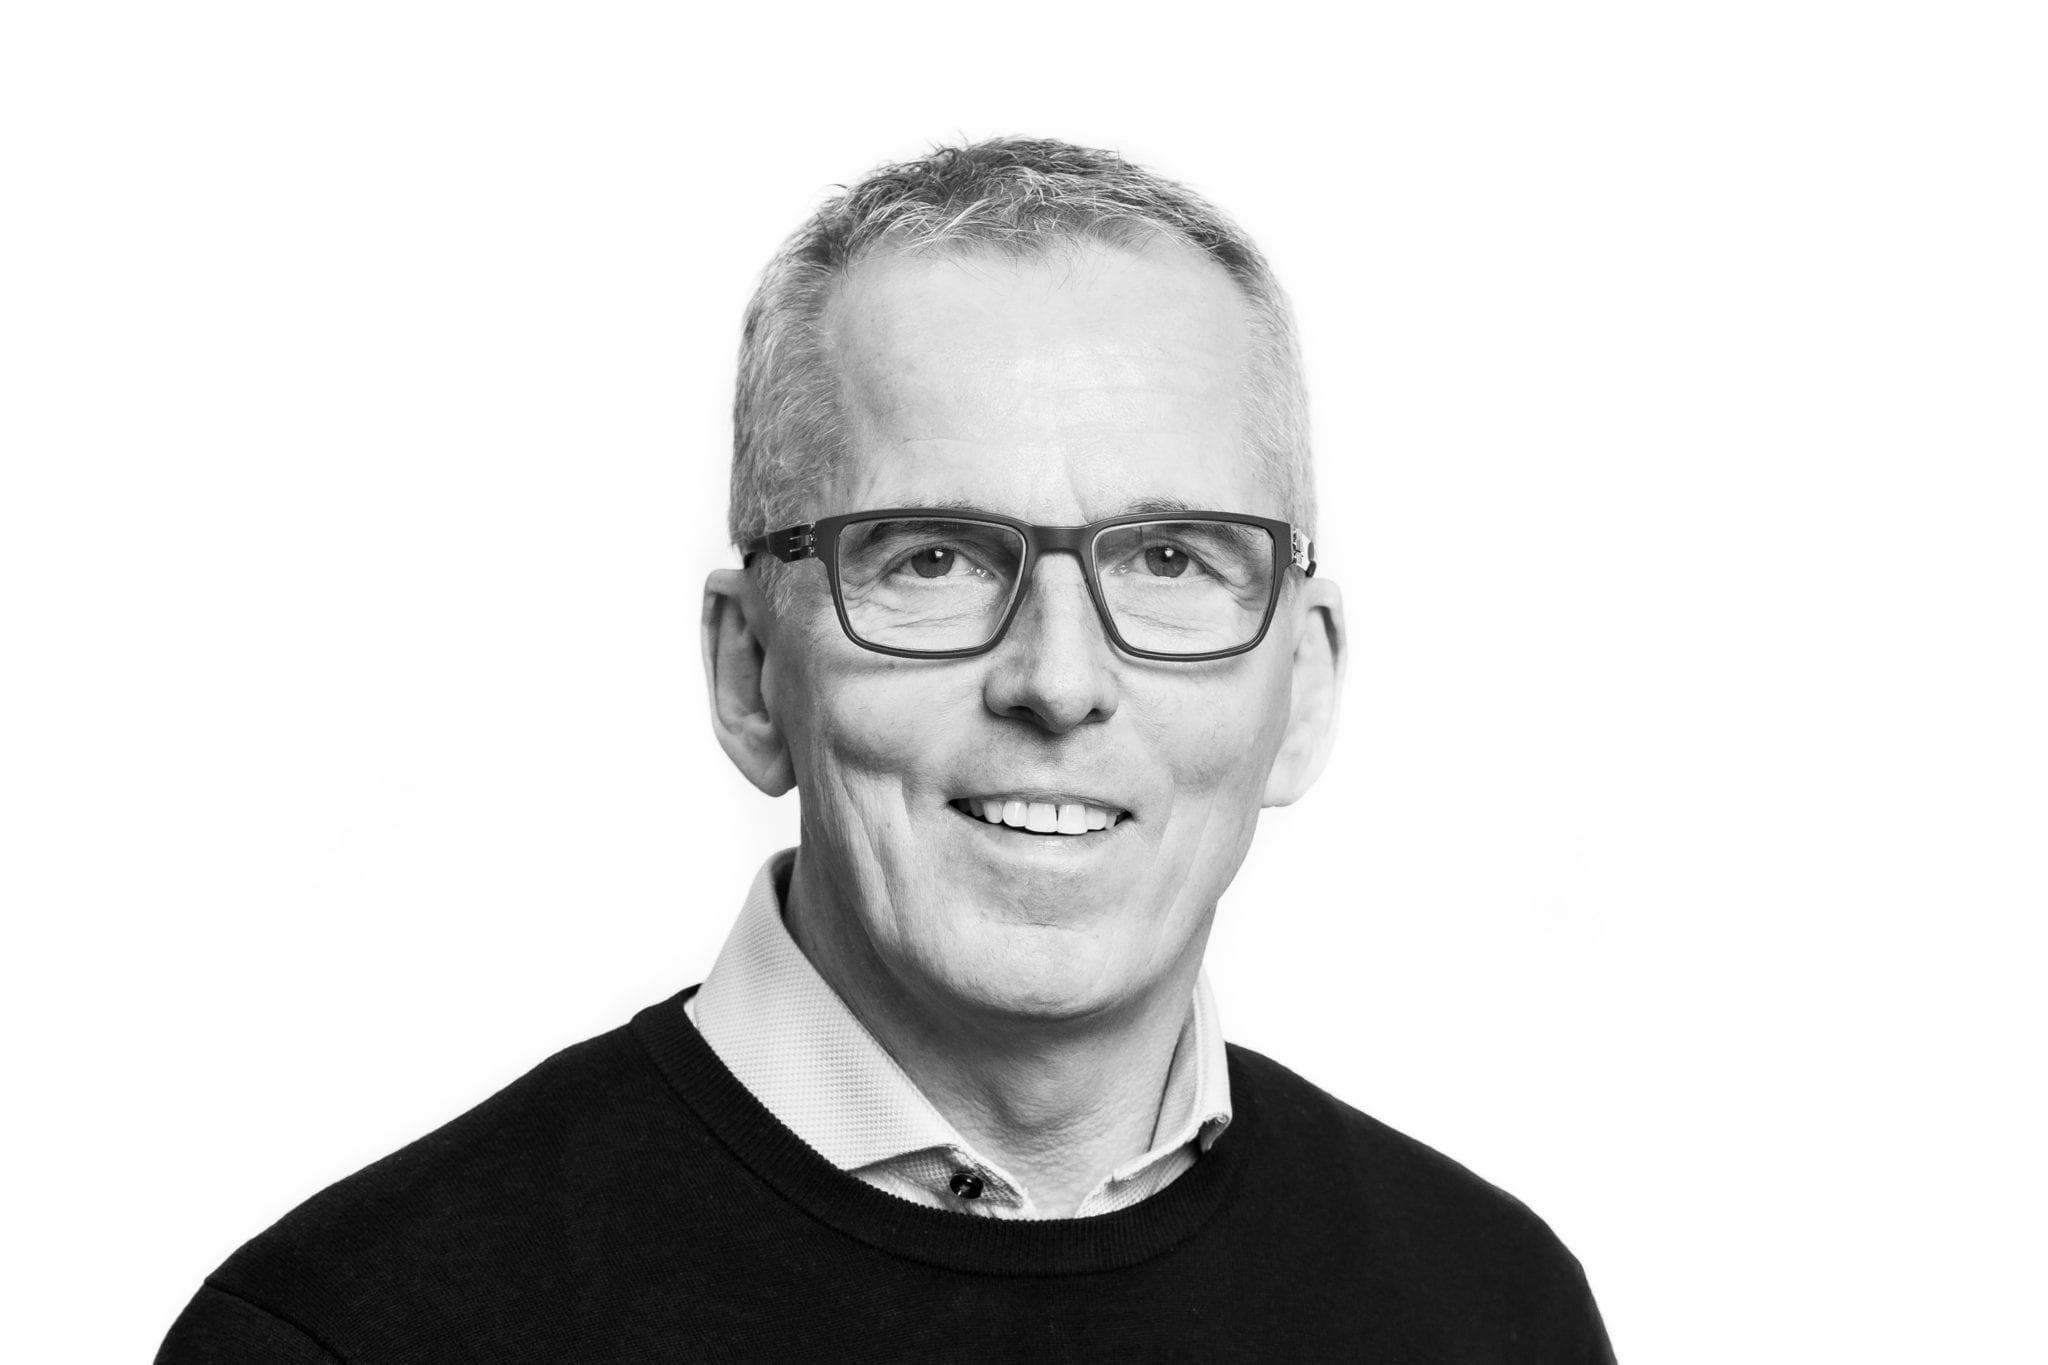 Atli Örn Jónsson